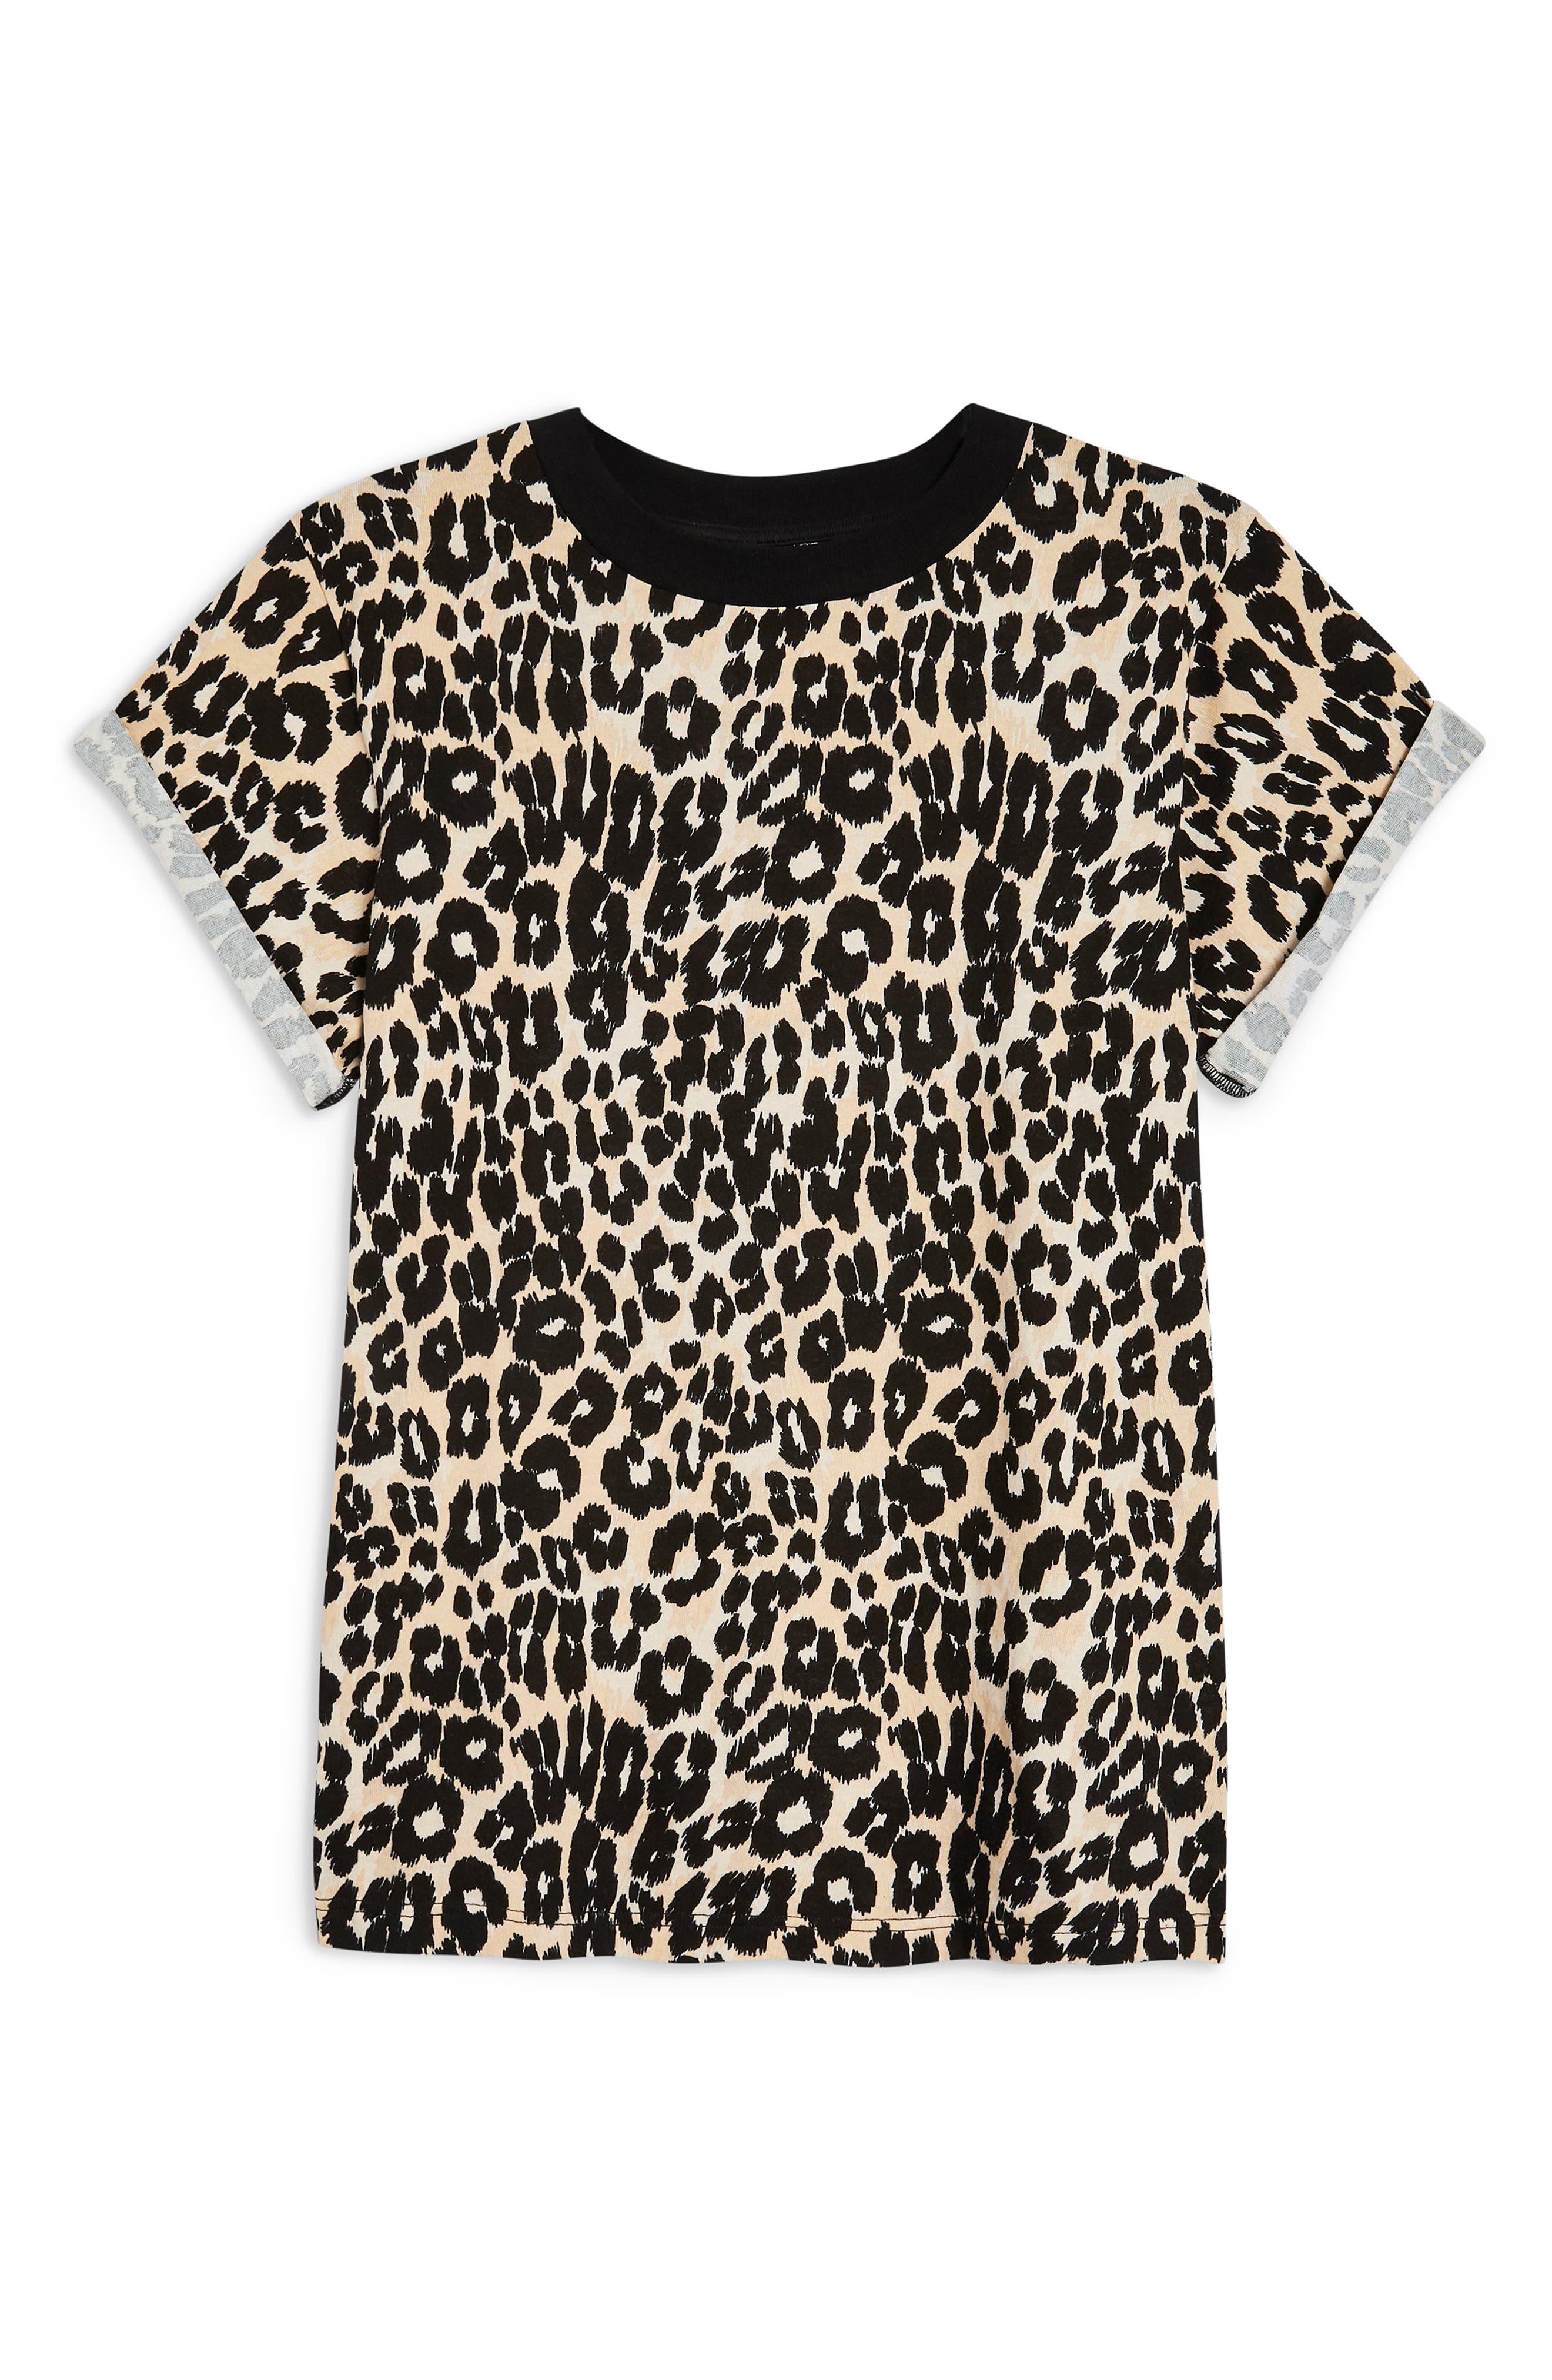 TOPSHOP, Leopard Print Tee, Alternate thumbnail 4, color, 001